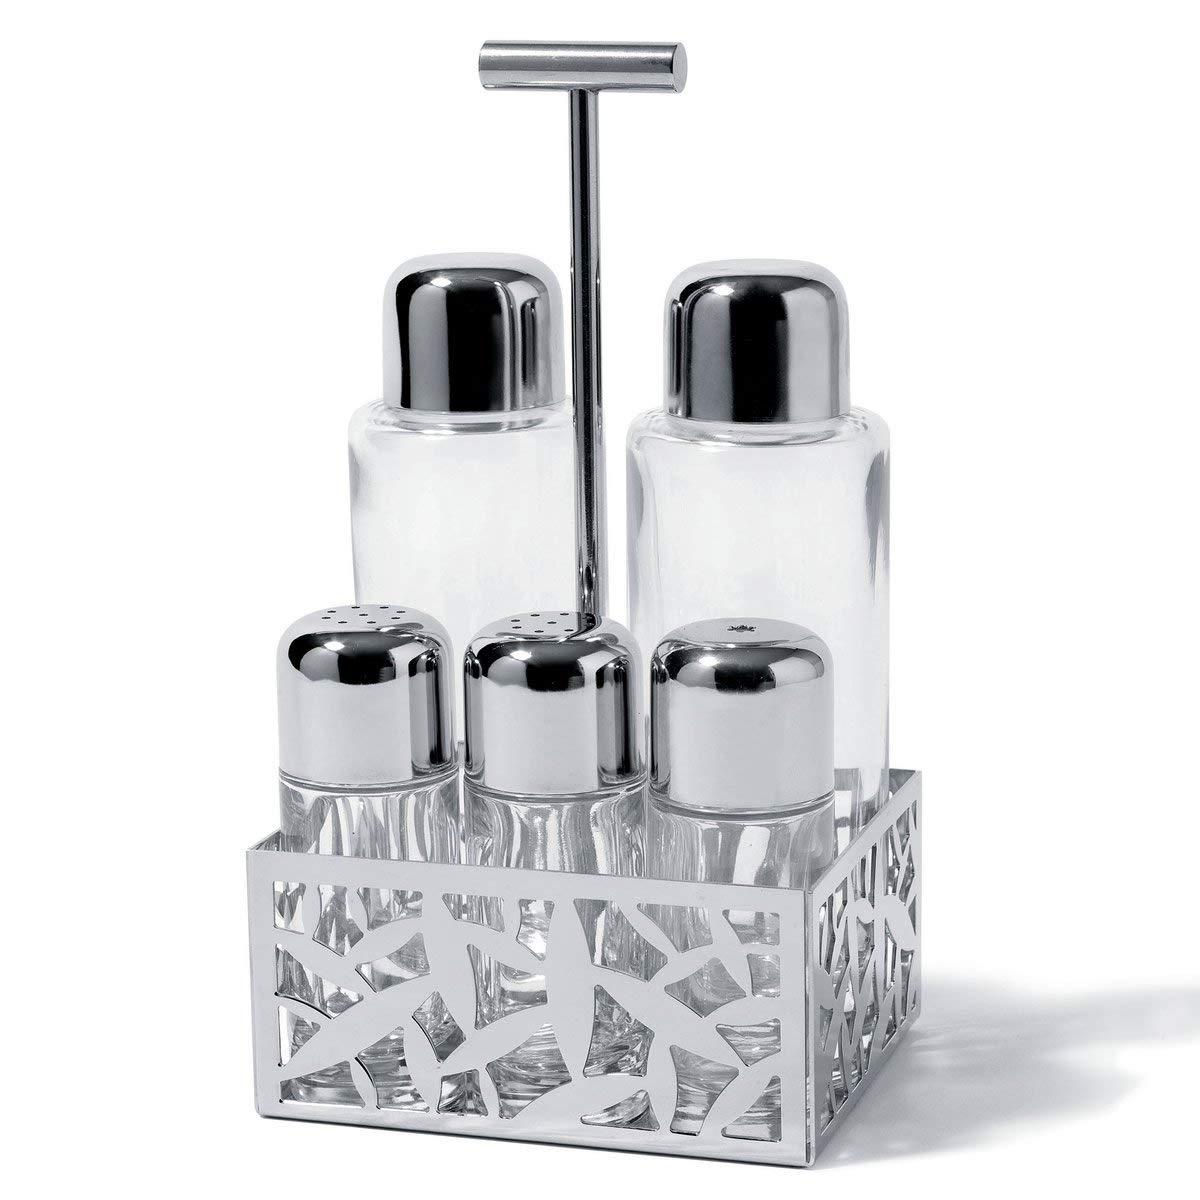 Alessi MSA16'' Pcs''''Cactus'' 5 Piece Condiment Set, Silver